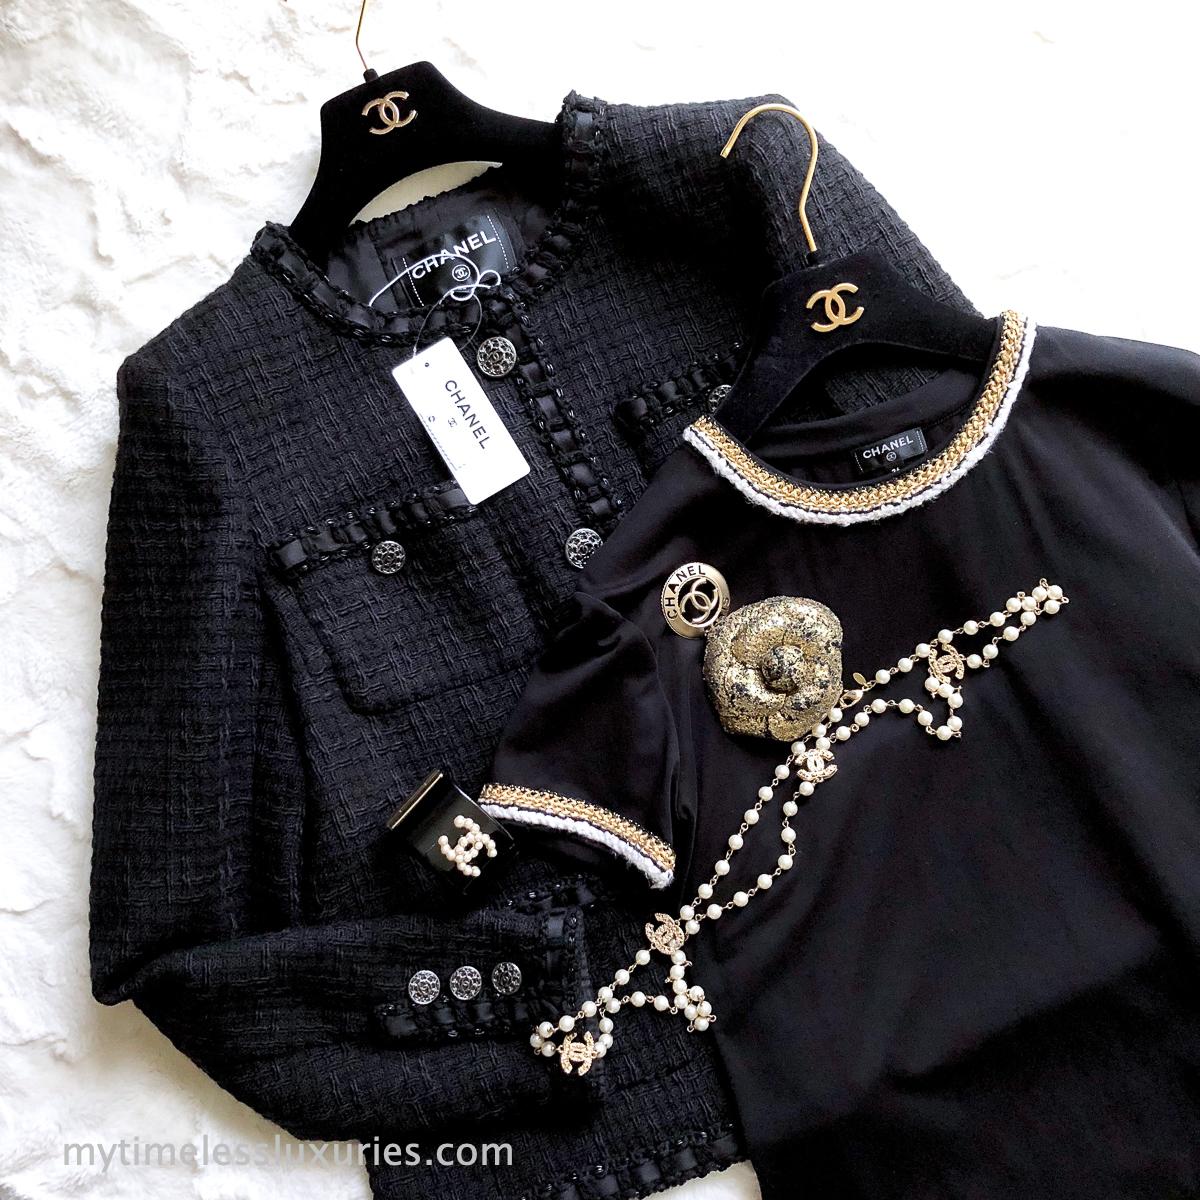 chanel-16a-paris-in-rome-little-black-jacket-40-42-fr-nwt-110.jpg